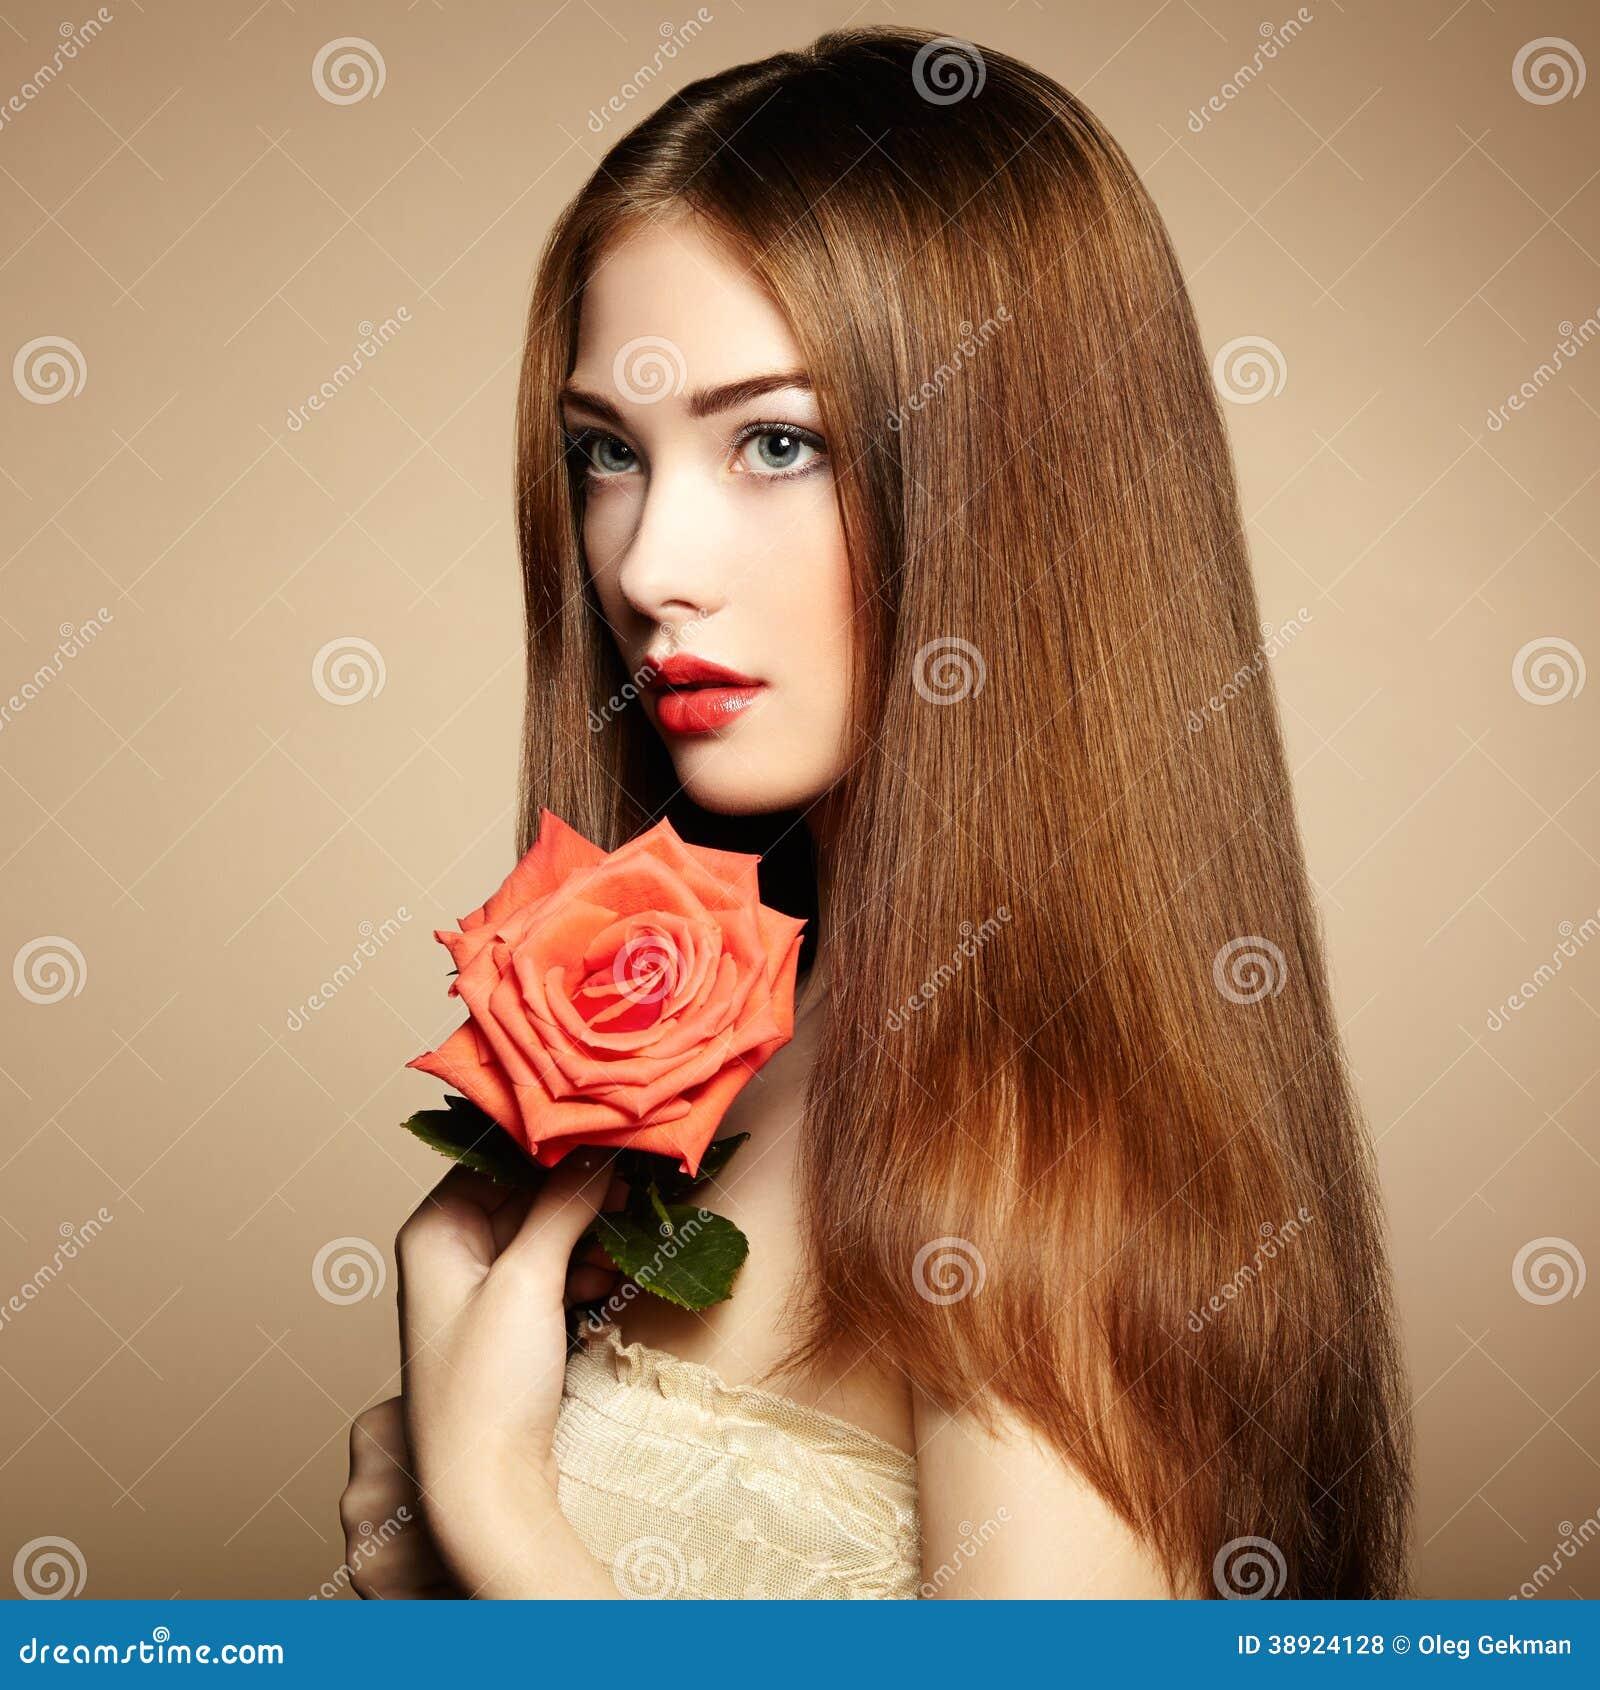 Fashion makeup beautiful models Stock Photo free download